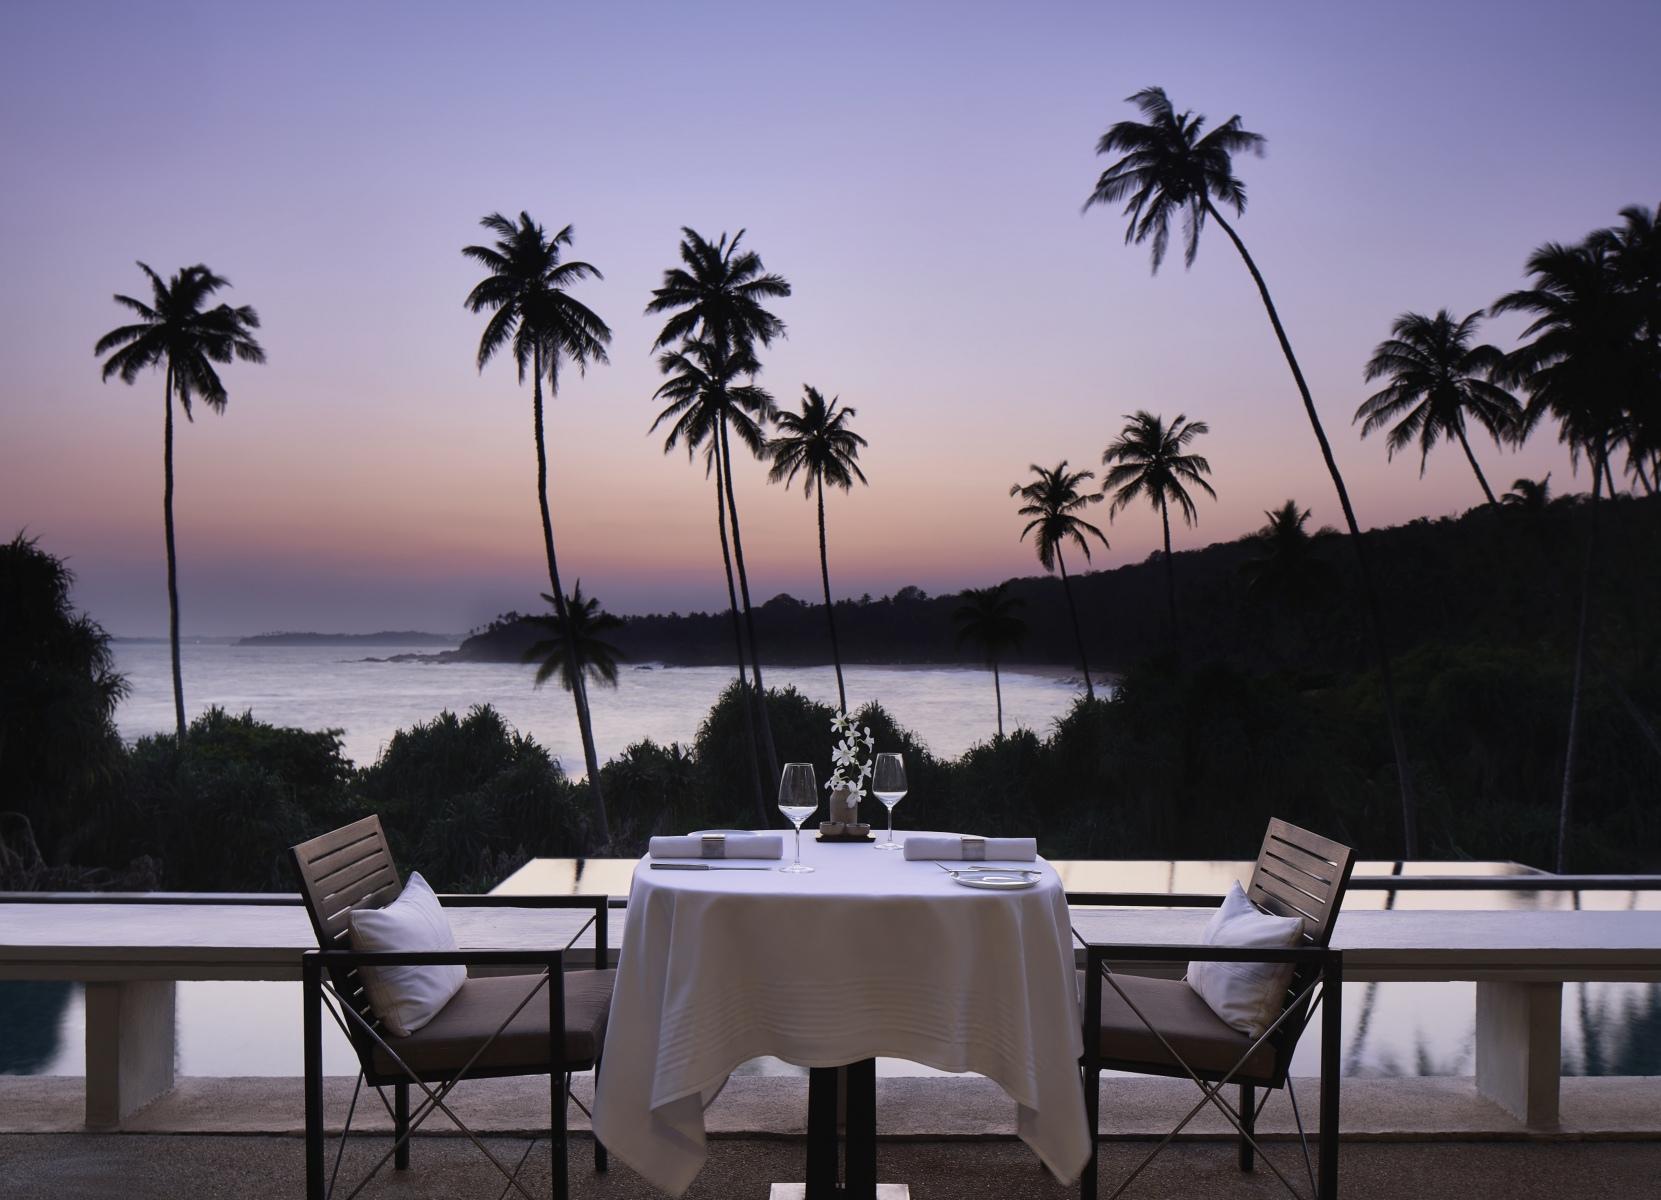 Amanwella, Sri Lanka - outside dining, evening.tif